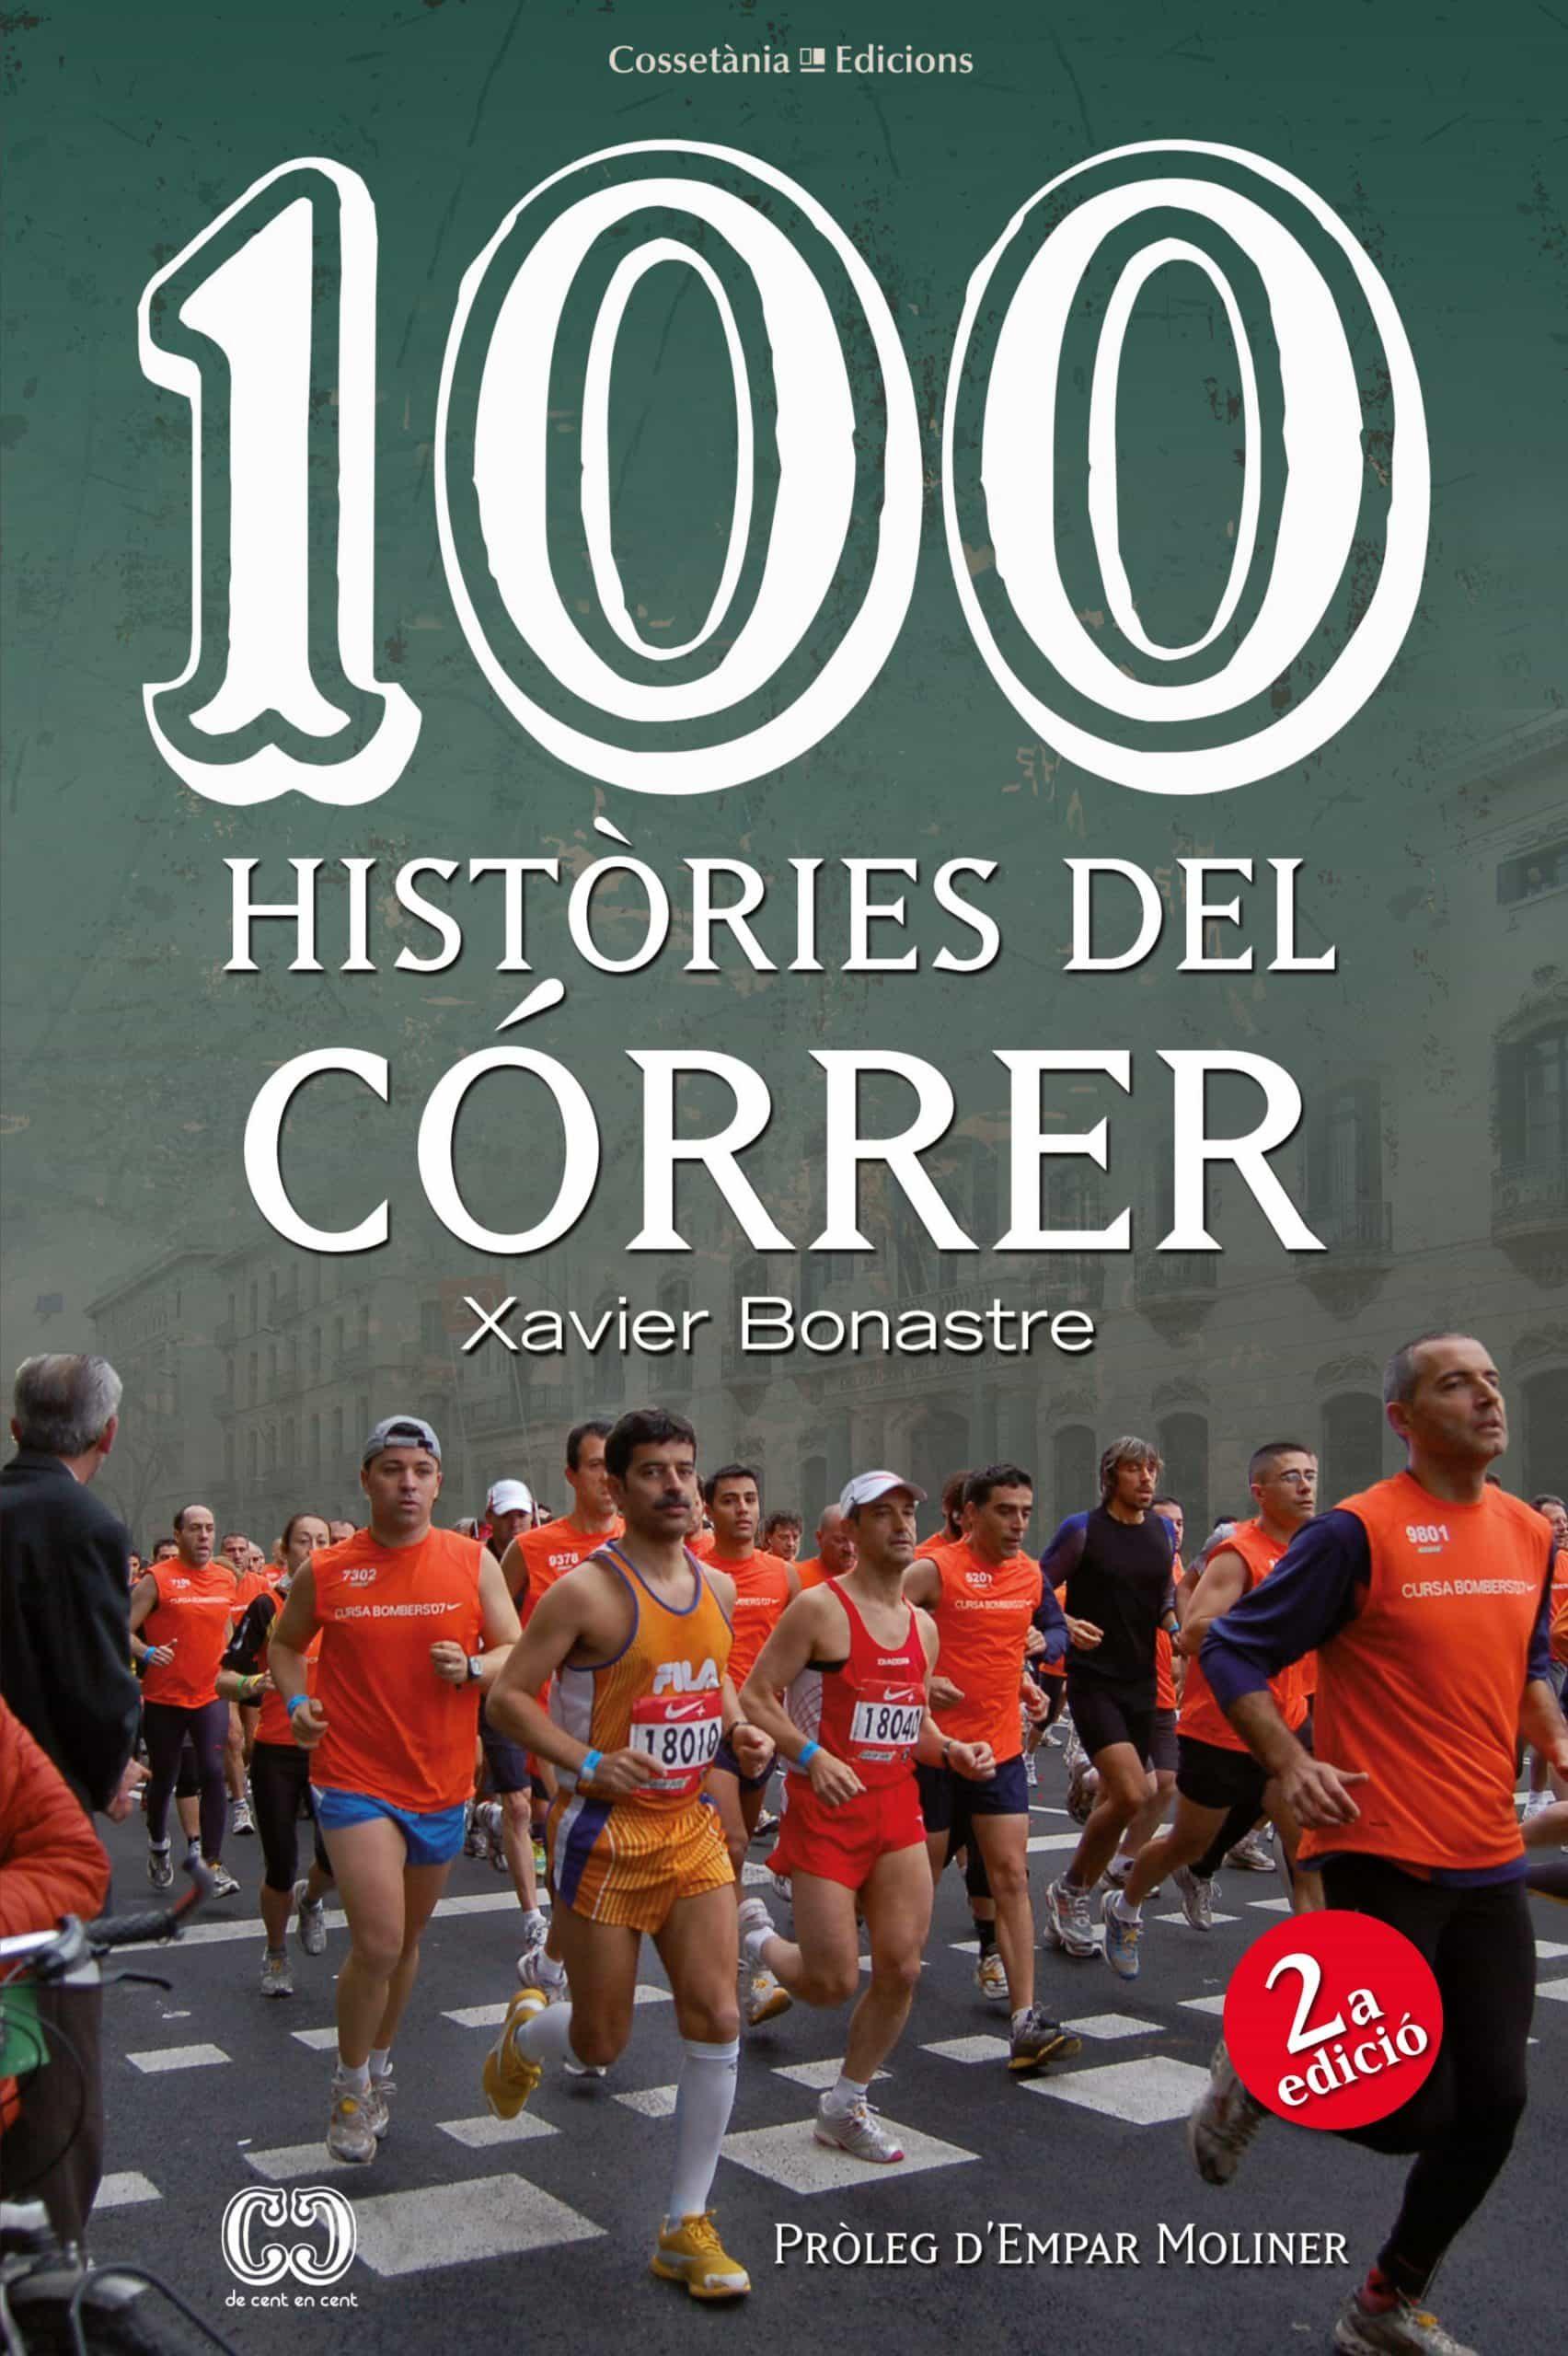 100 histories del córrer-xavier bonastre-9788490348055